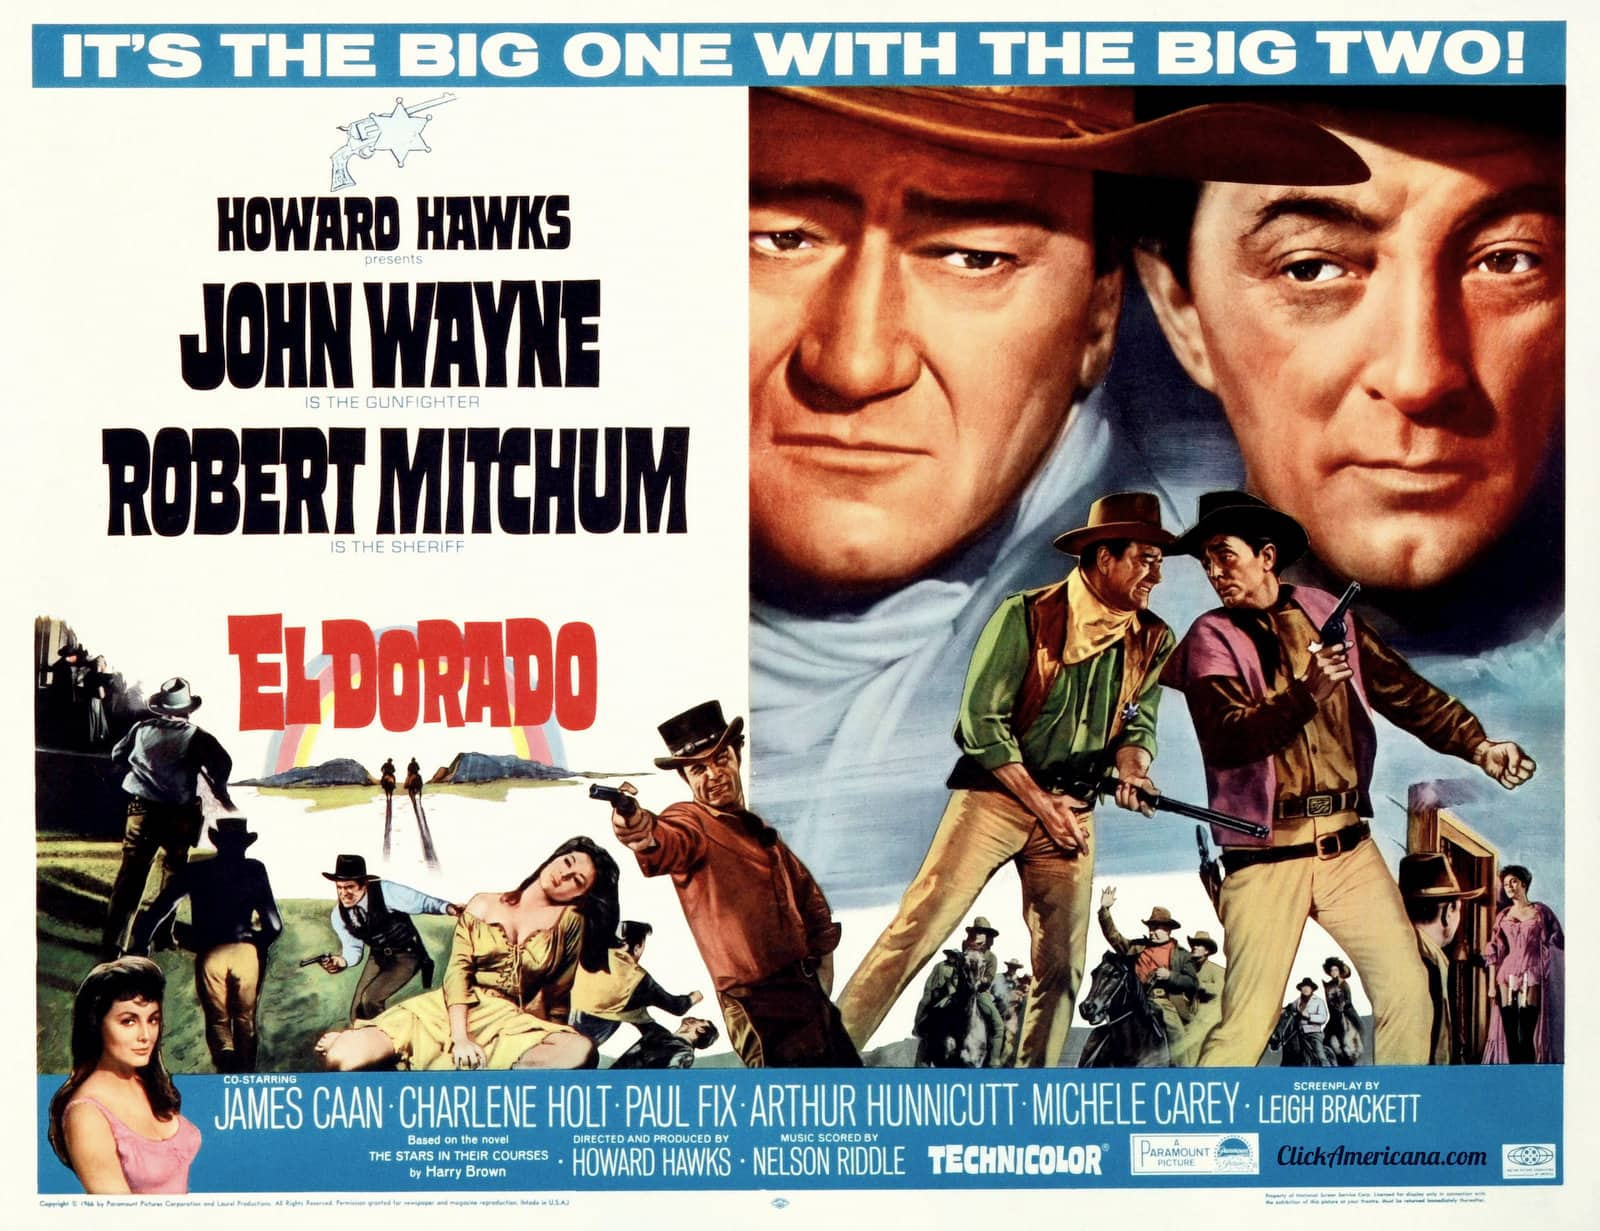 John Wayne and Robert Mitchup in El Dorado movie (1966)